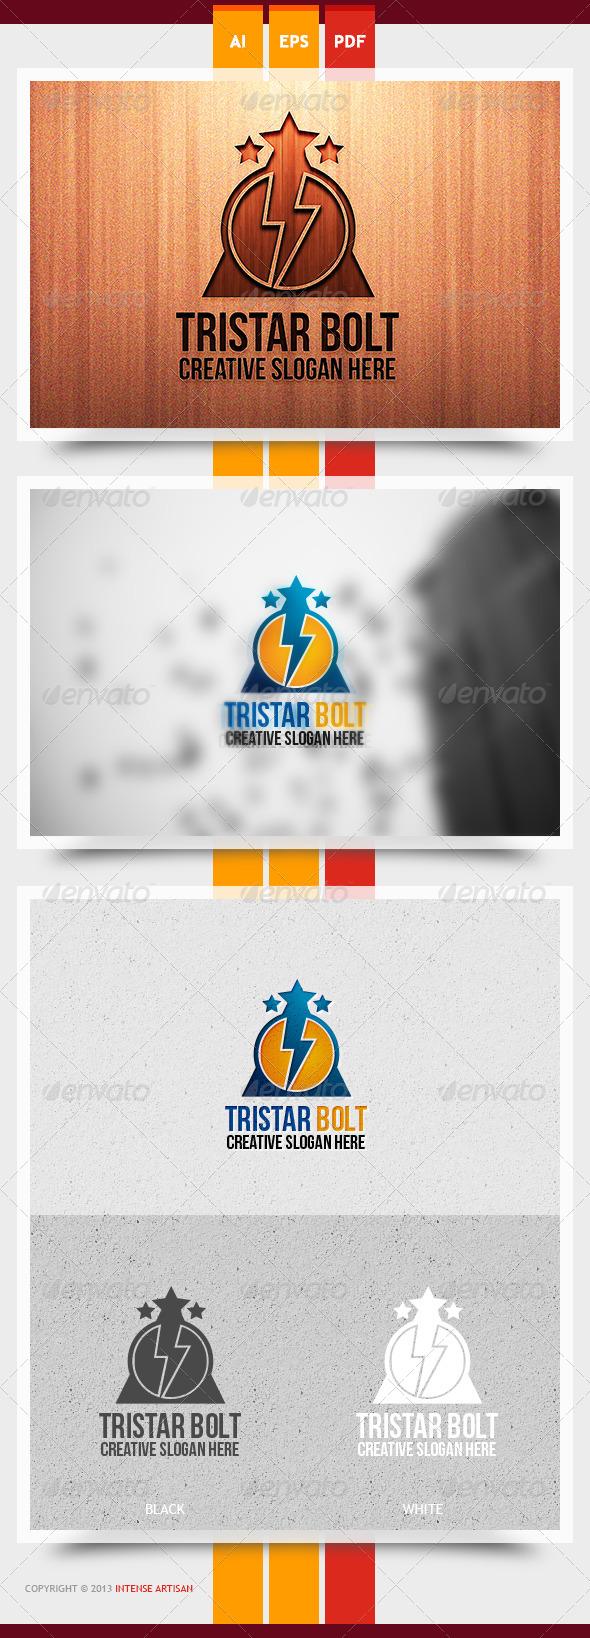 Tristar Bolt Logo Template - Objects Logo Templates